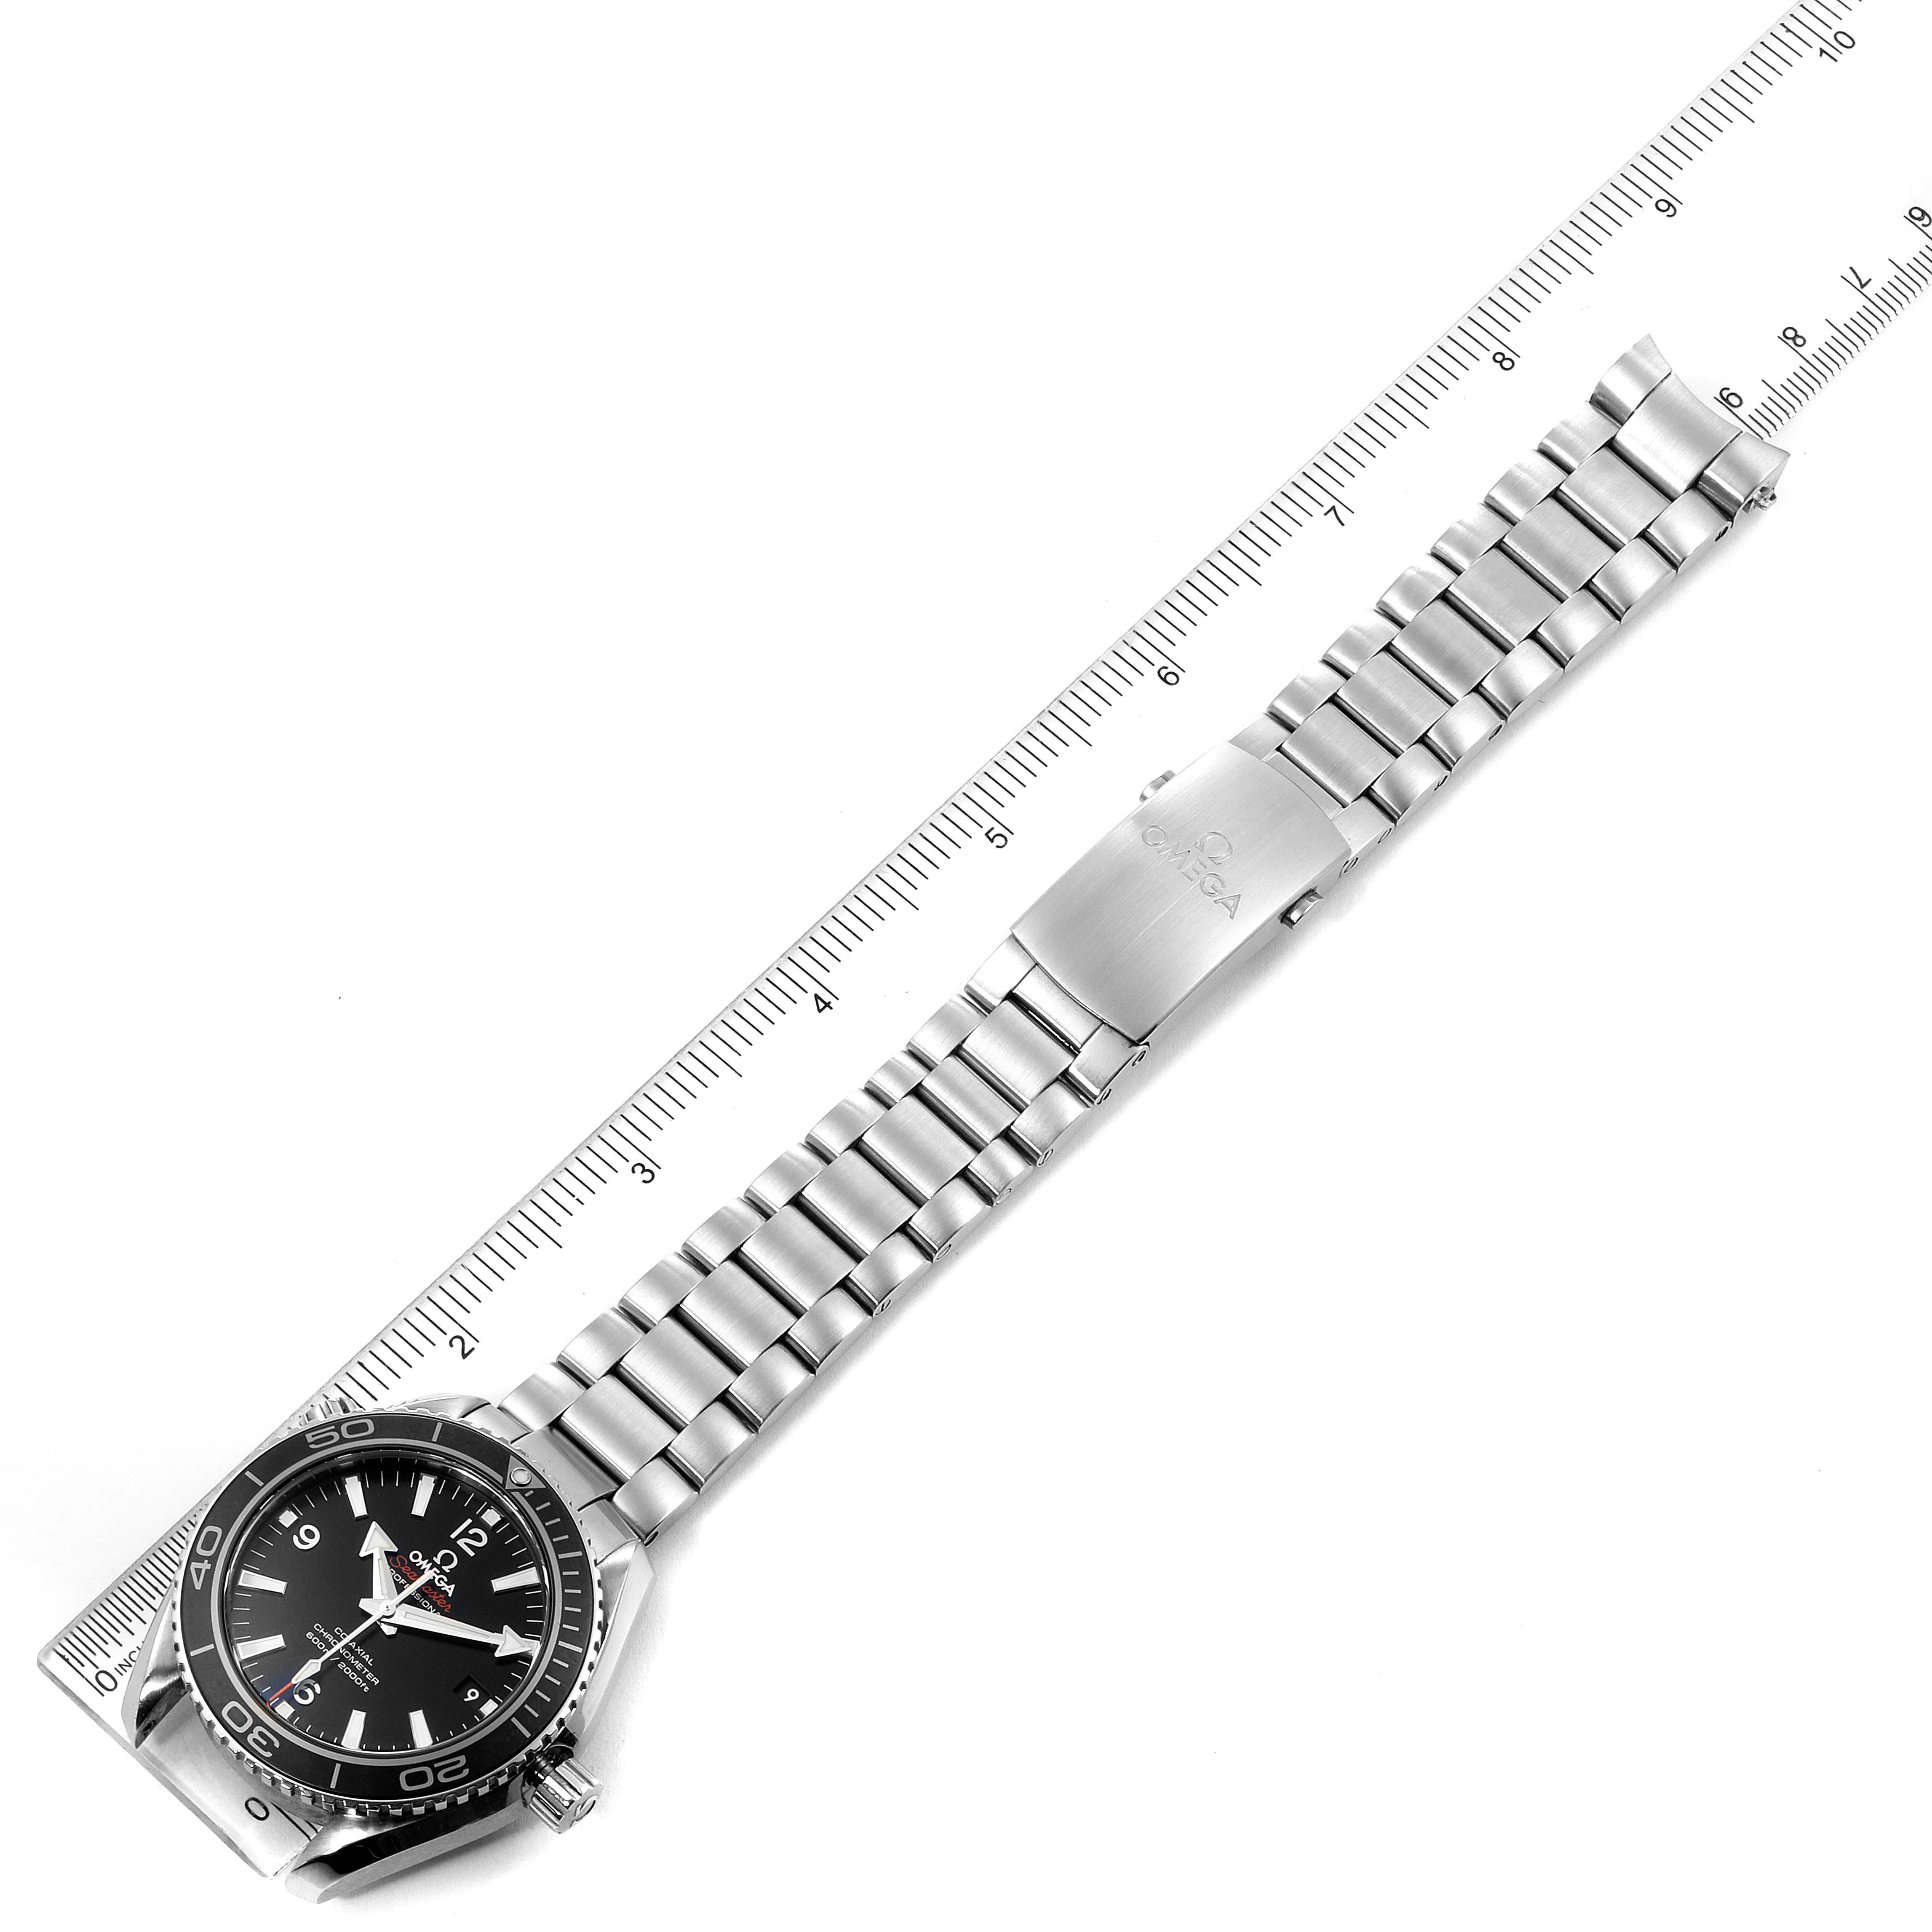 Omega Seamaster Planet Ocean Steel Mens Watch 232.30.42.21.01.001 Box Card SwissWatchExpo